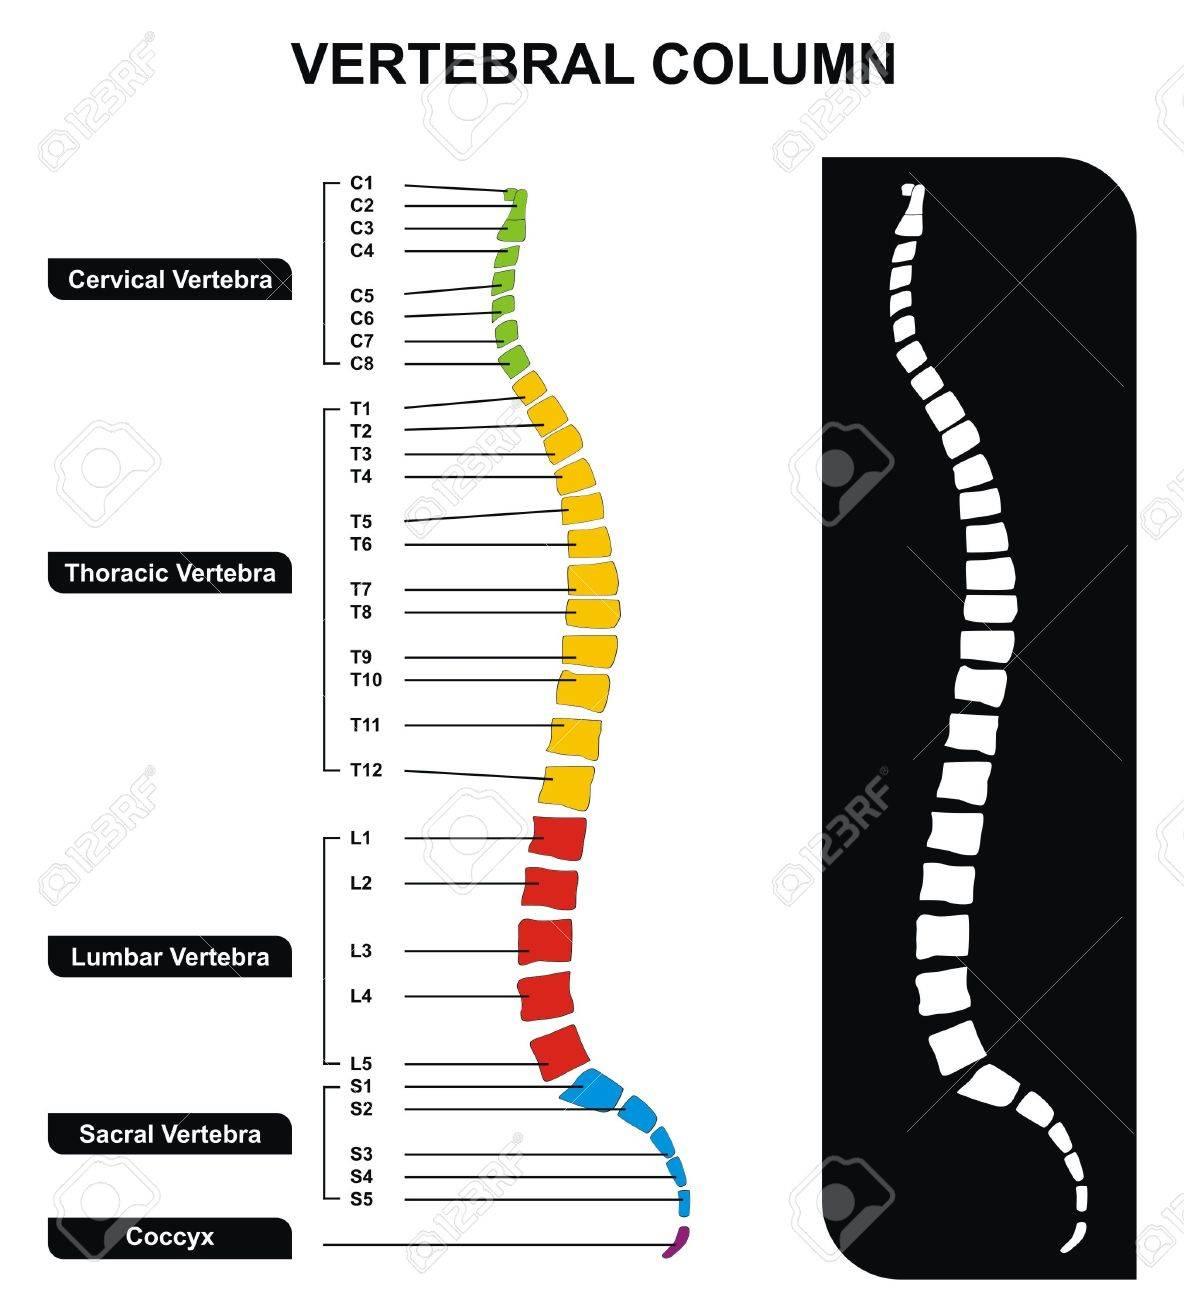 Vector Vertel Column Spine Diagram including Verte Groups.. on spine layout, spine joints, spine icon, spine numbering, spinal cord injury, pharyngeal arch, spine surgery, spine cartoon, spine too straight, spine fracture, spine graphic, skeletal pneumaticity, spine with nerves, spine segments, spine drawing, spine chart, spine with numbers, spine clipart, spine model, spine x-ray, spine l5-s1, spine anatomy, spine bones,